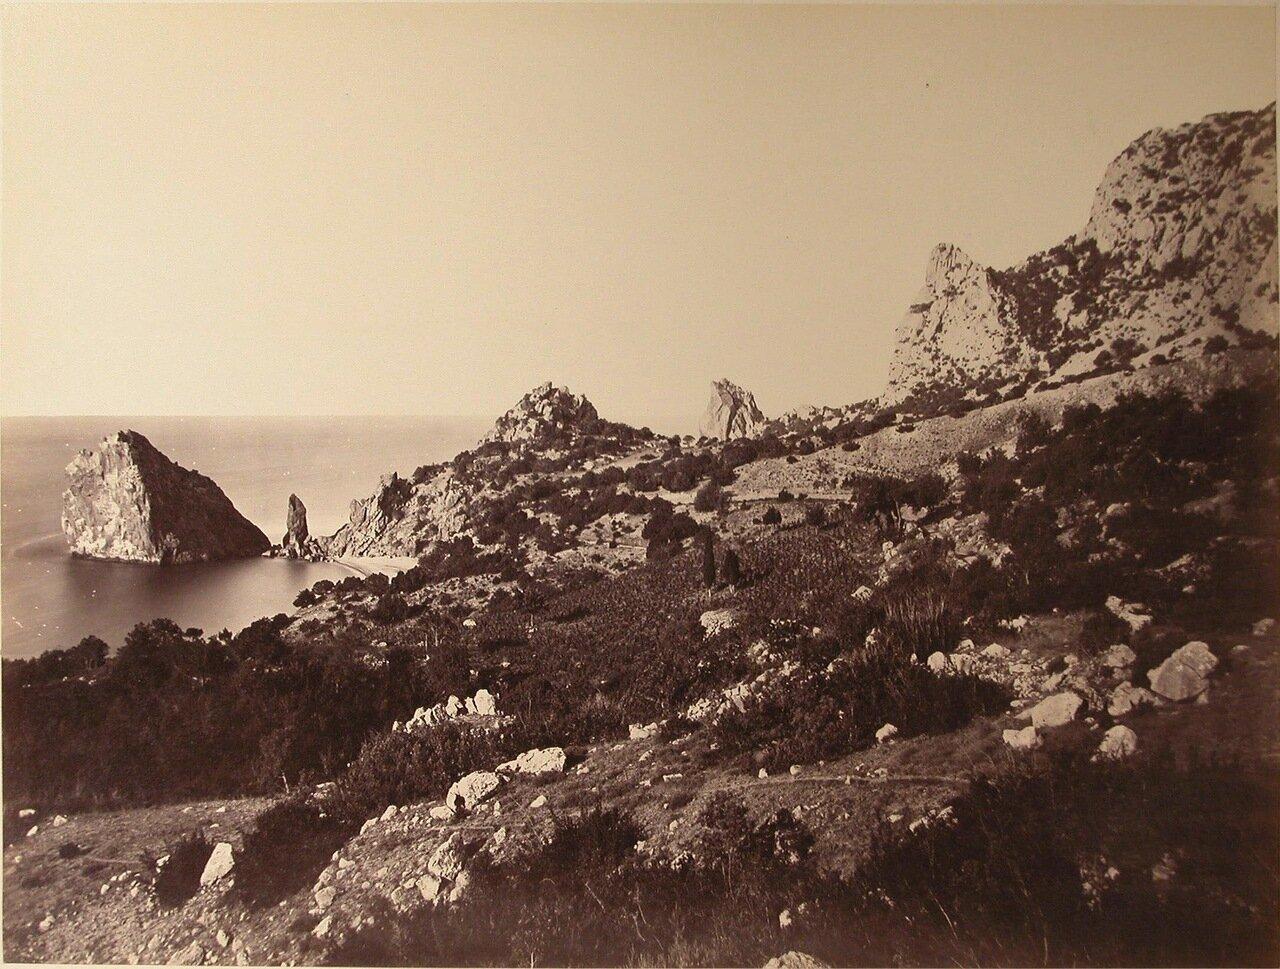 25. Симеиз. Скалы на побережье у мыса Ай-Панда